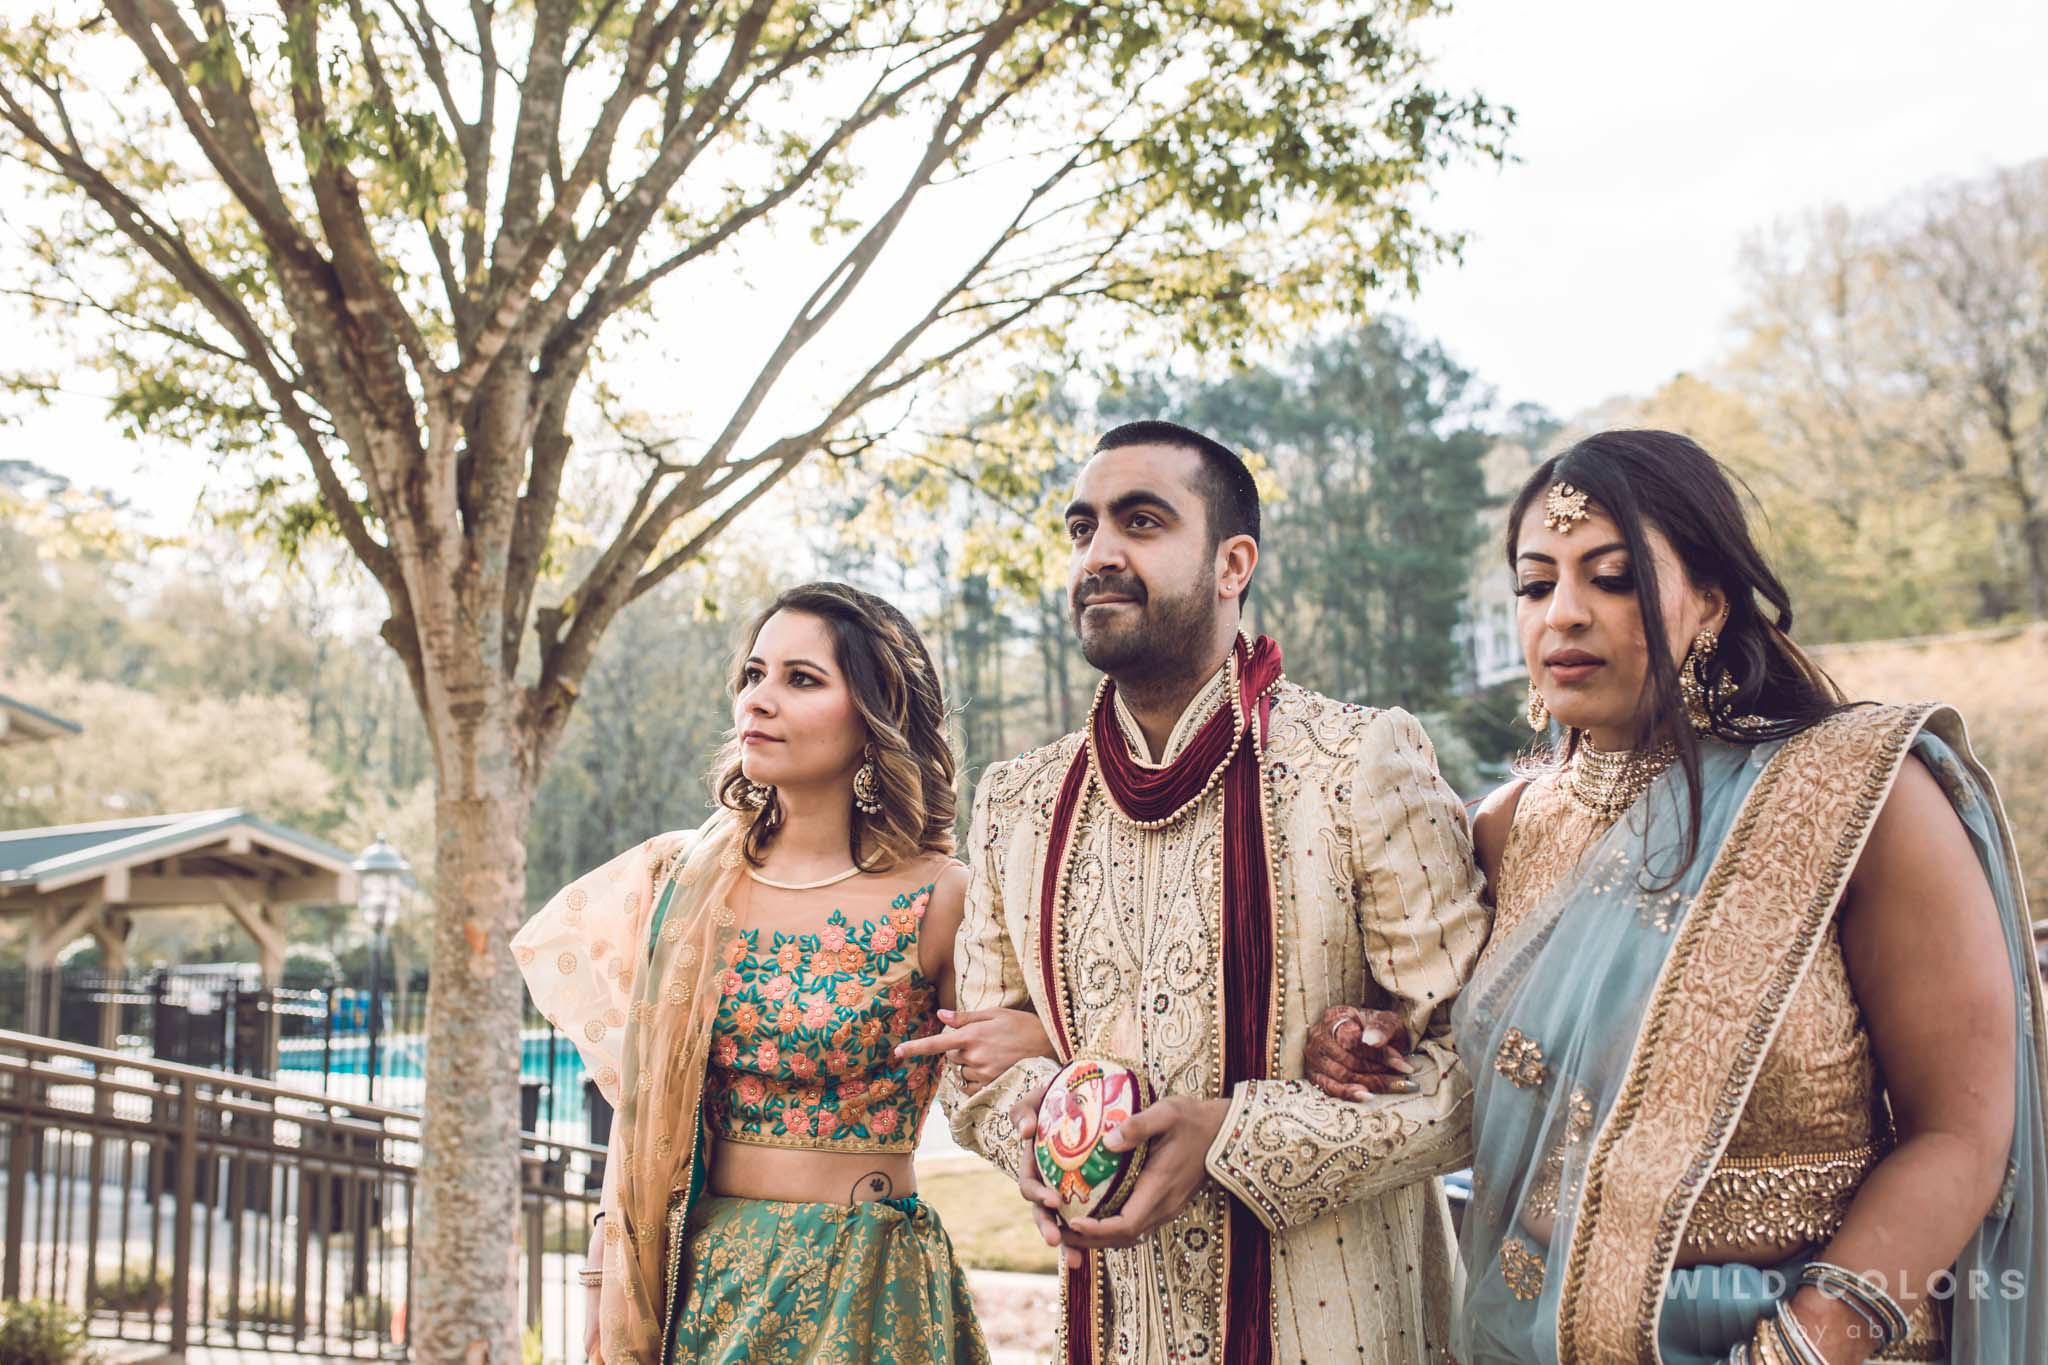 CANDID_INDIAN_WEDDING_ATLANTA_PHOTOGRAPHER-39.JPG